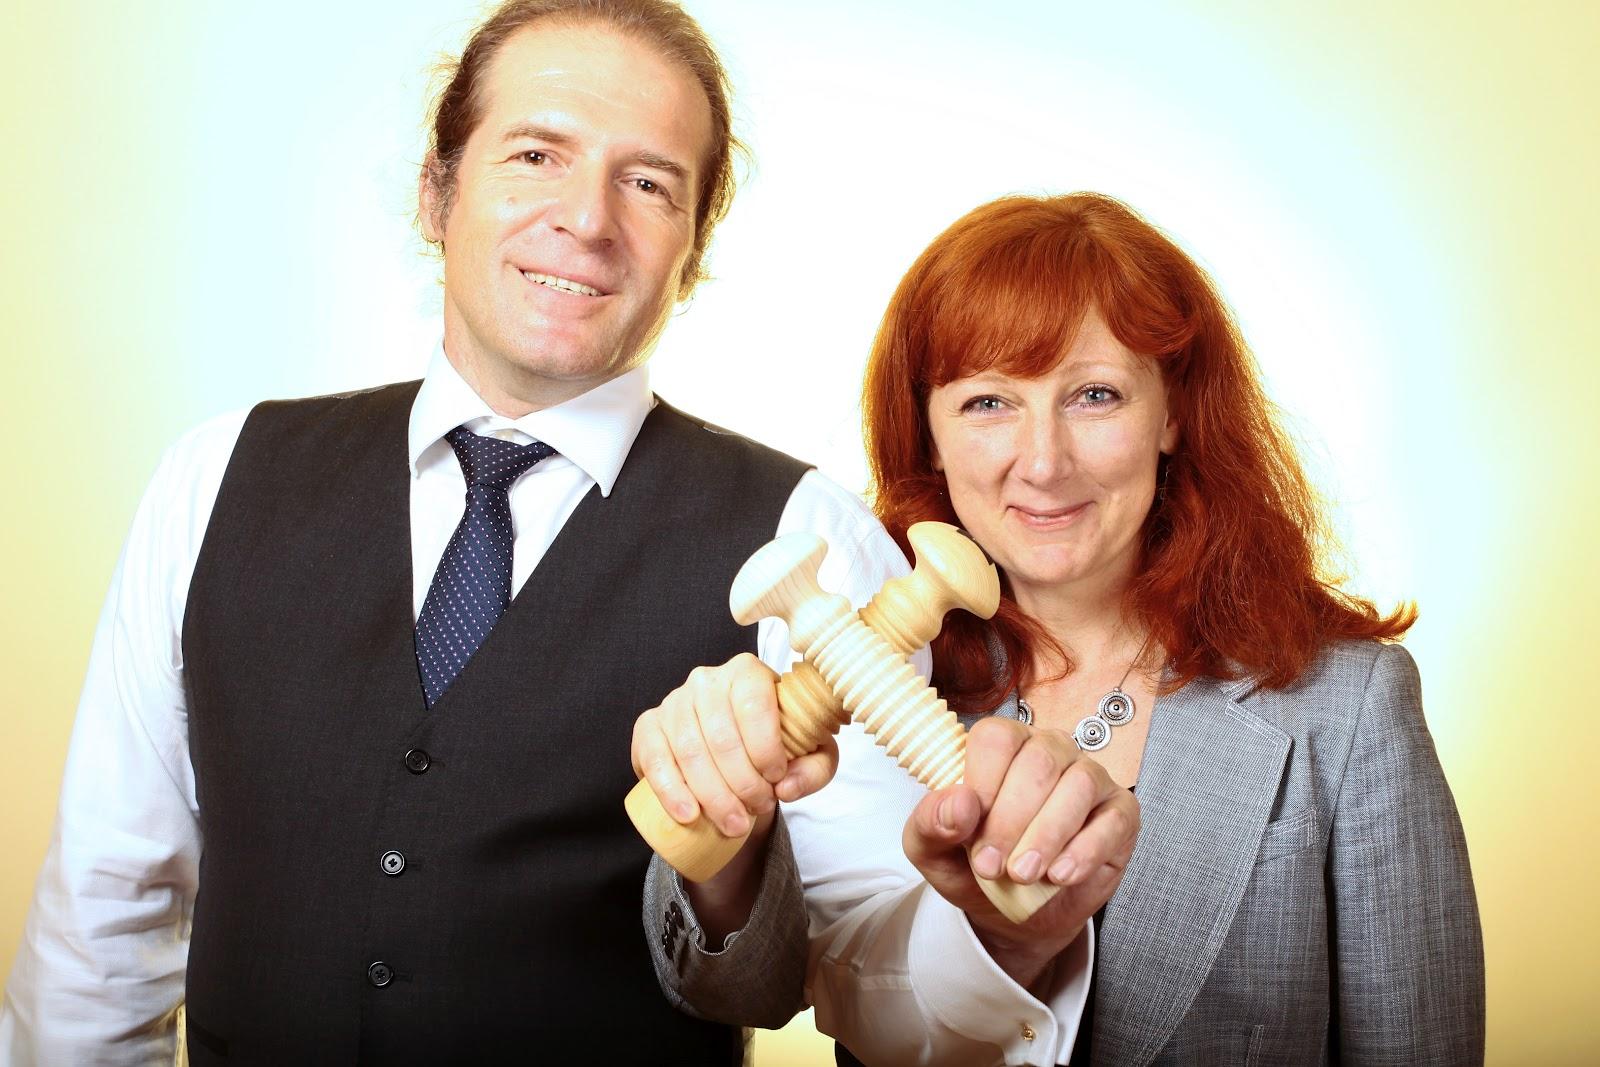 portrét Miloše Píchy a Radky Maňákové s rukověťmi managera